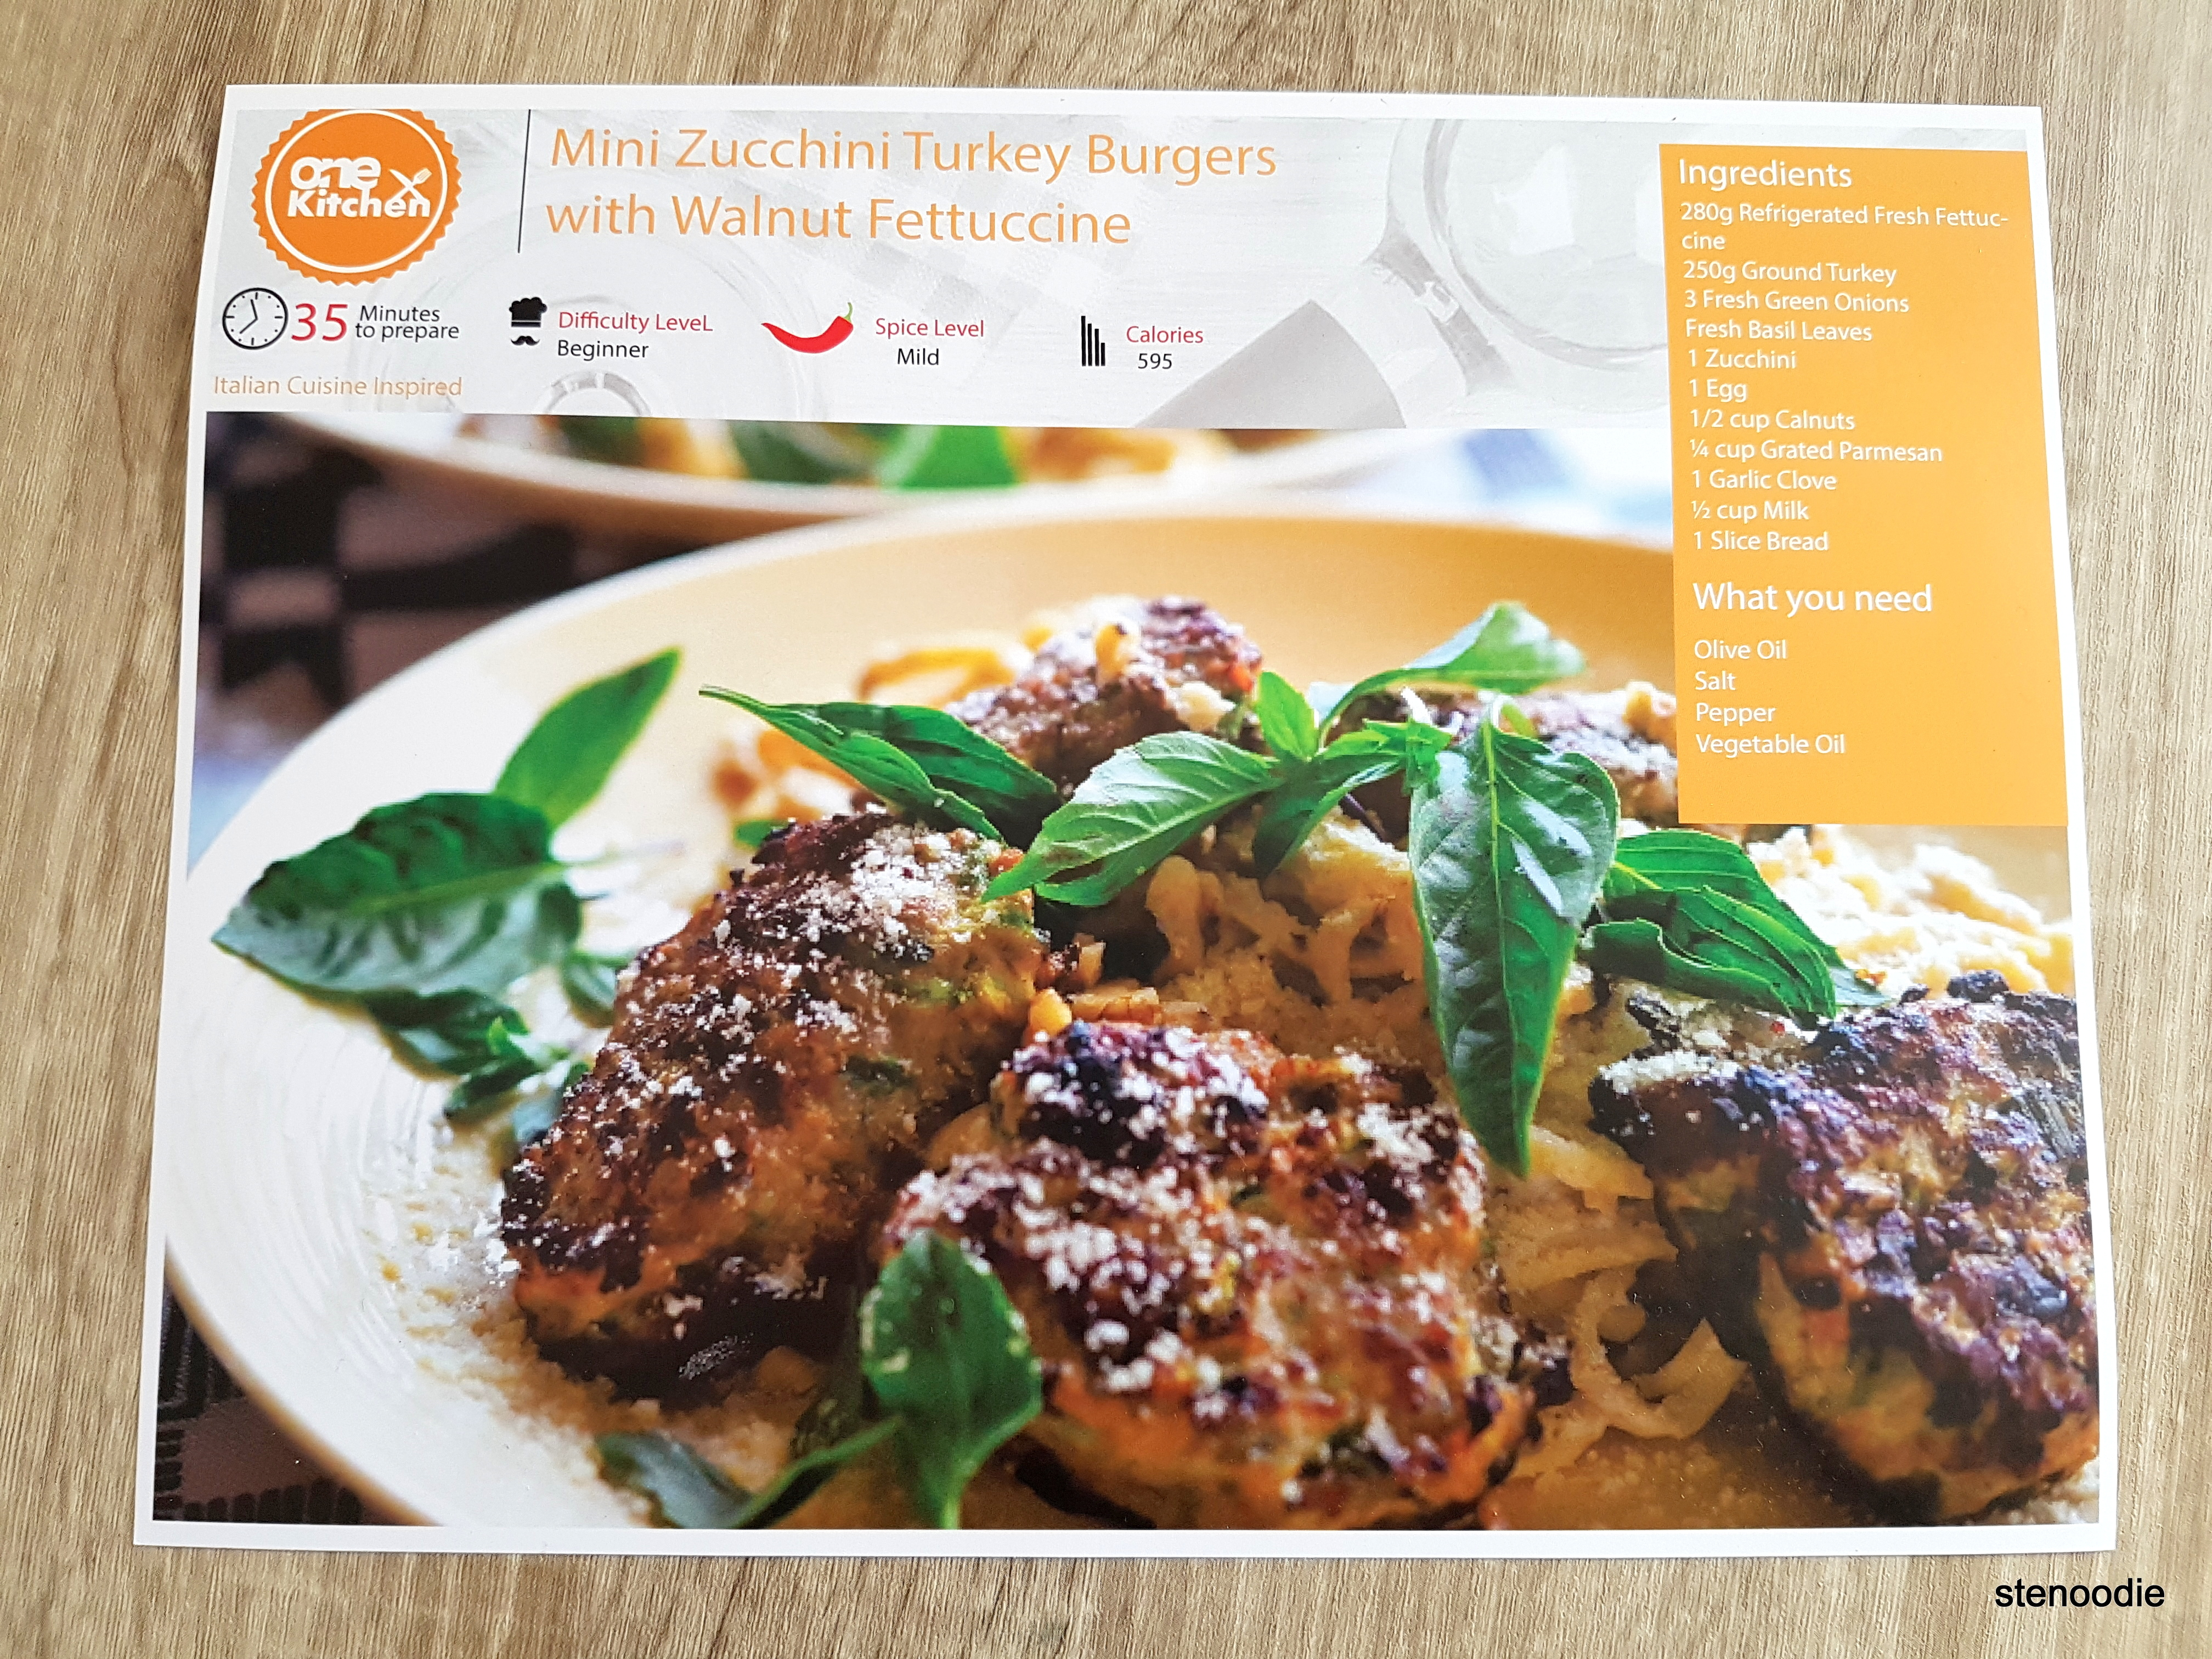 Mini Zucchini Turkey Burgers with Walnut Fettucini recipe card